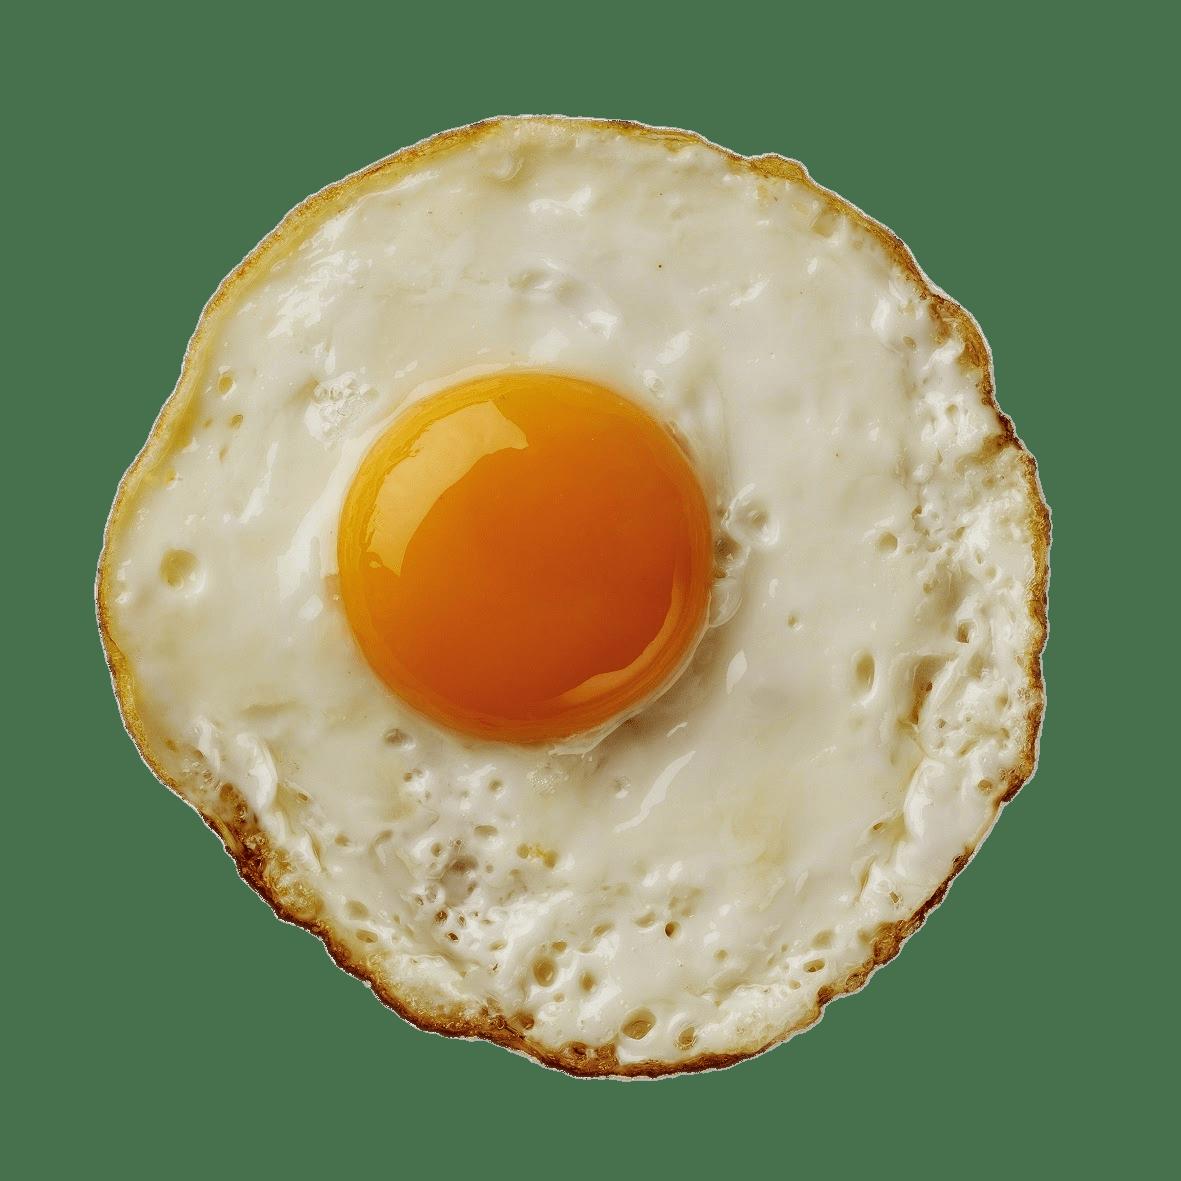 clipart transparent library eggs transparent fried #96102393